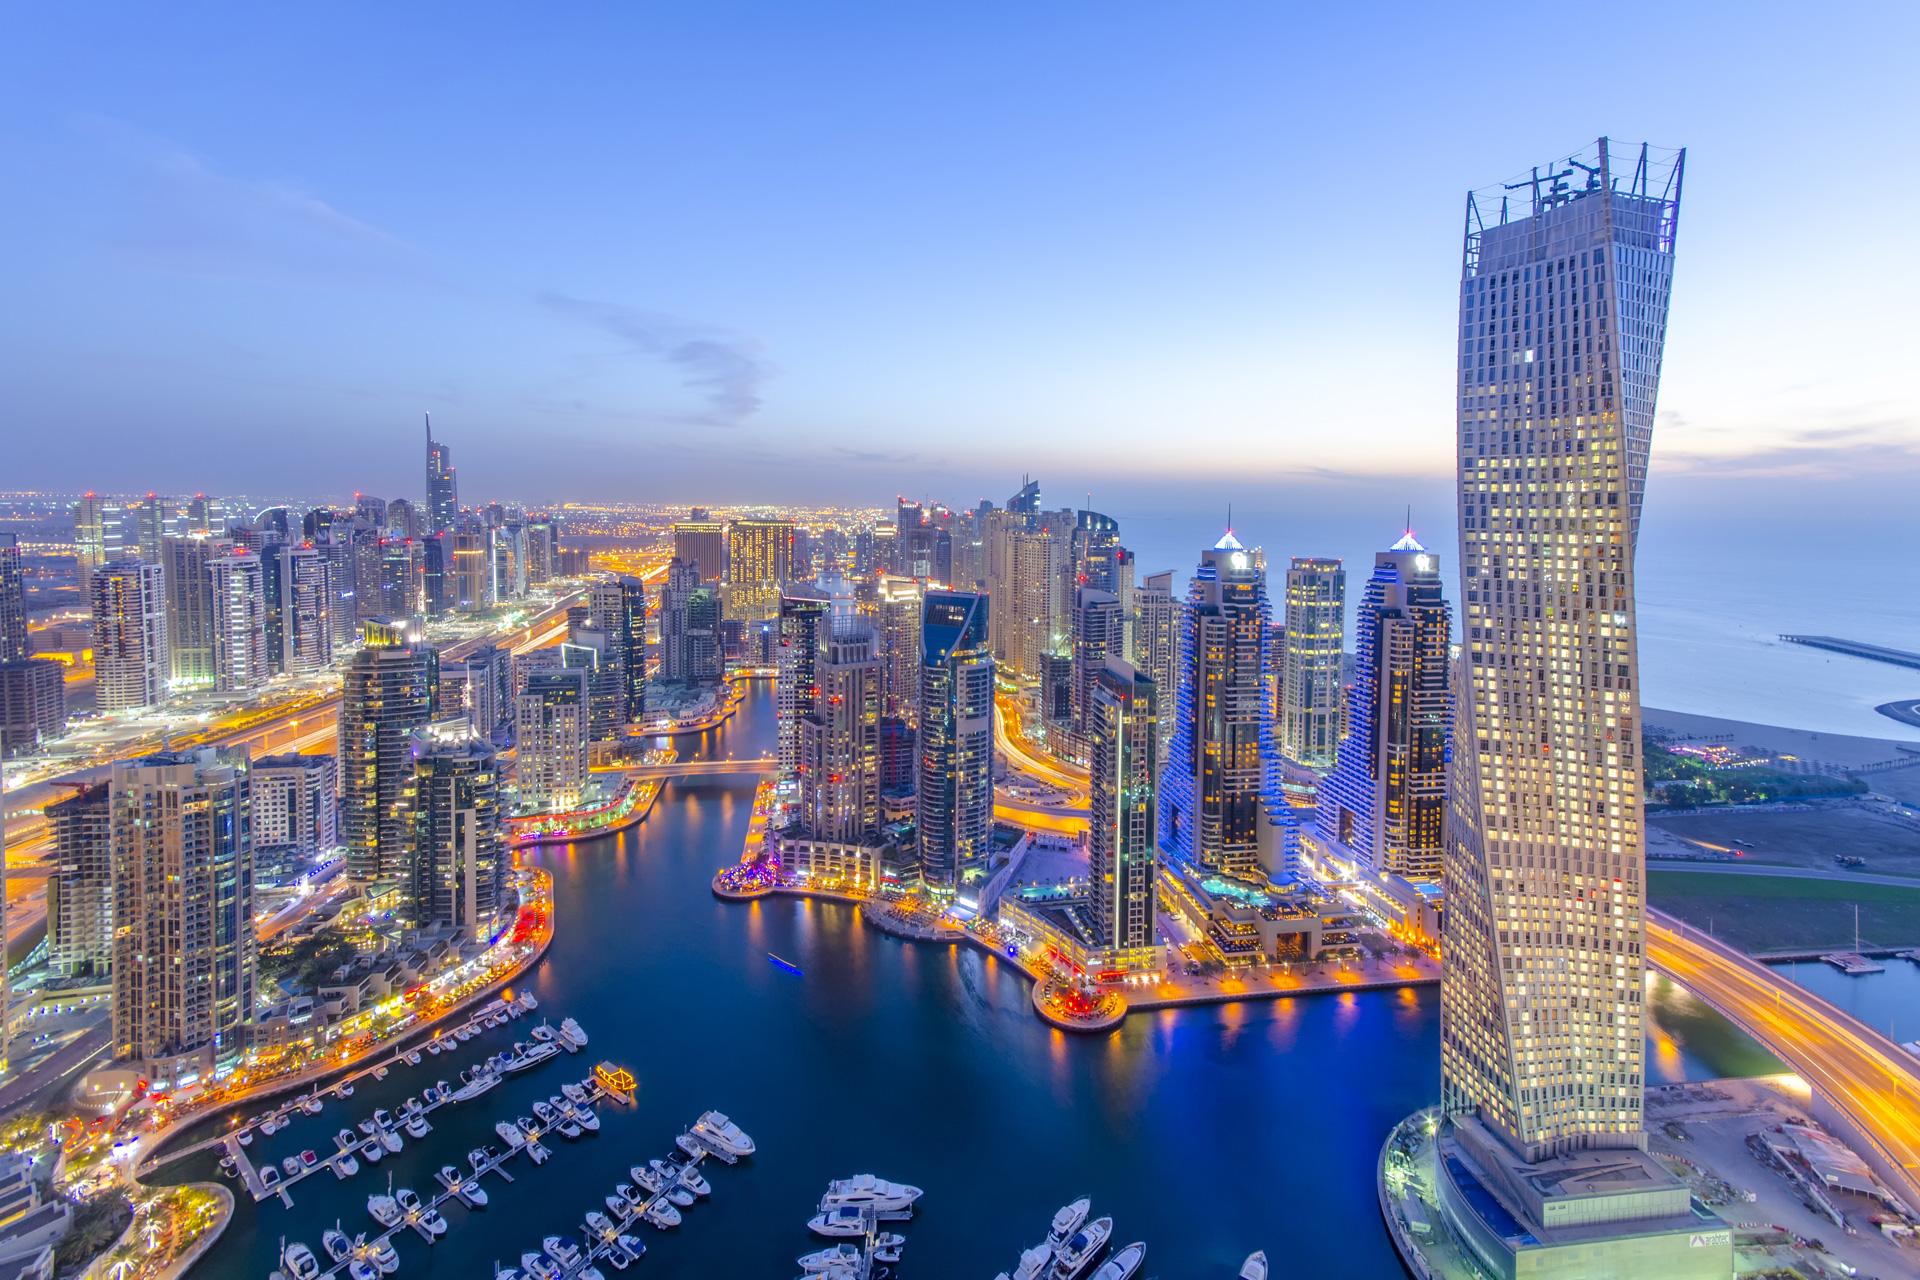 Dubai Tourism to provide hotels CO2 emission analysis